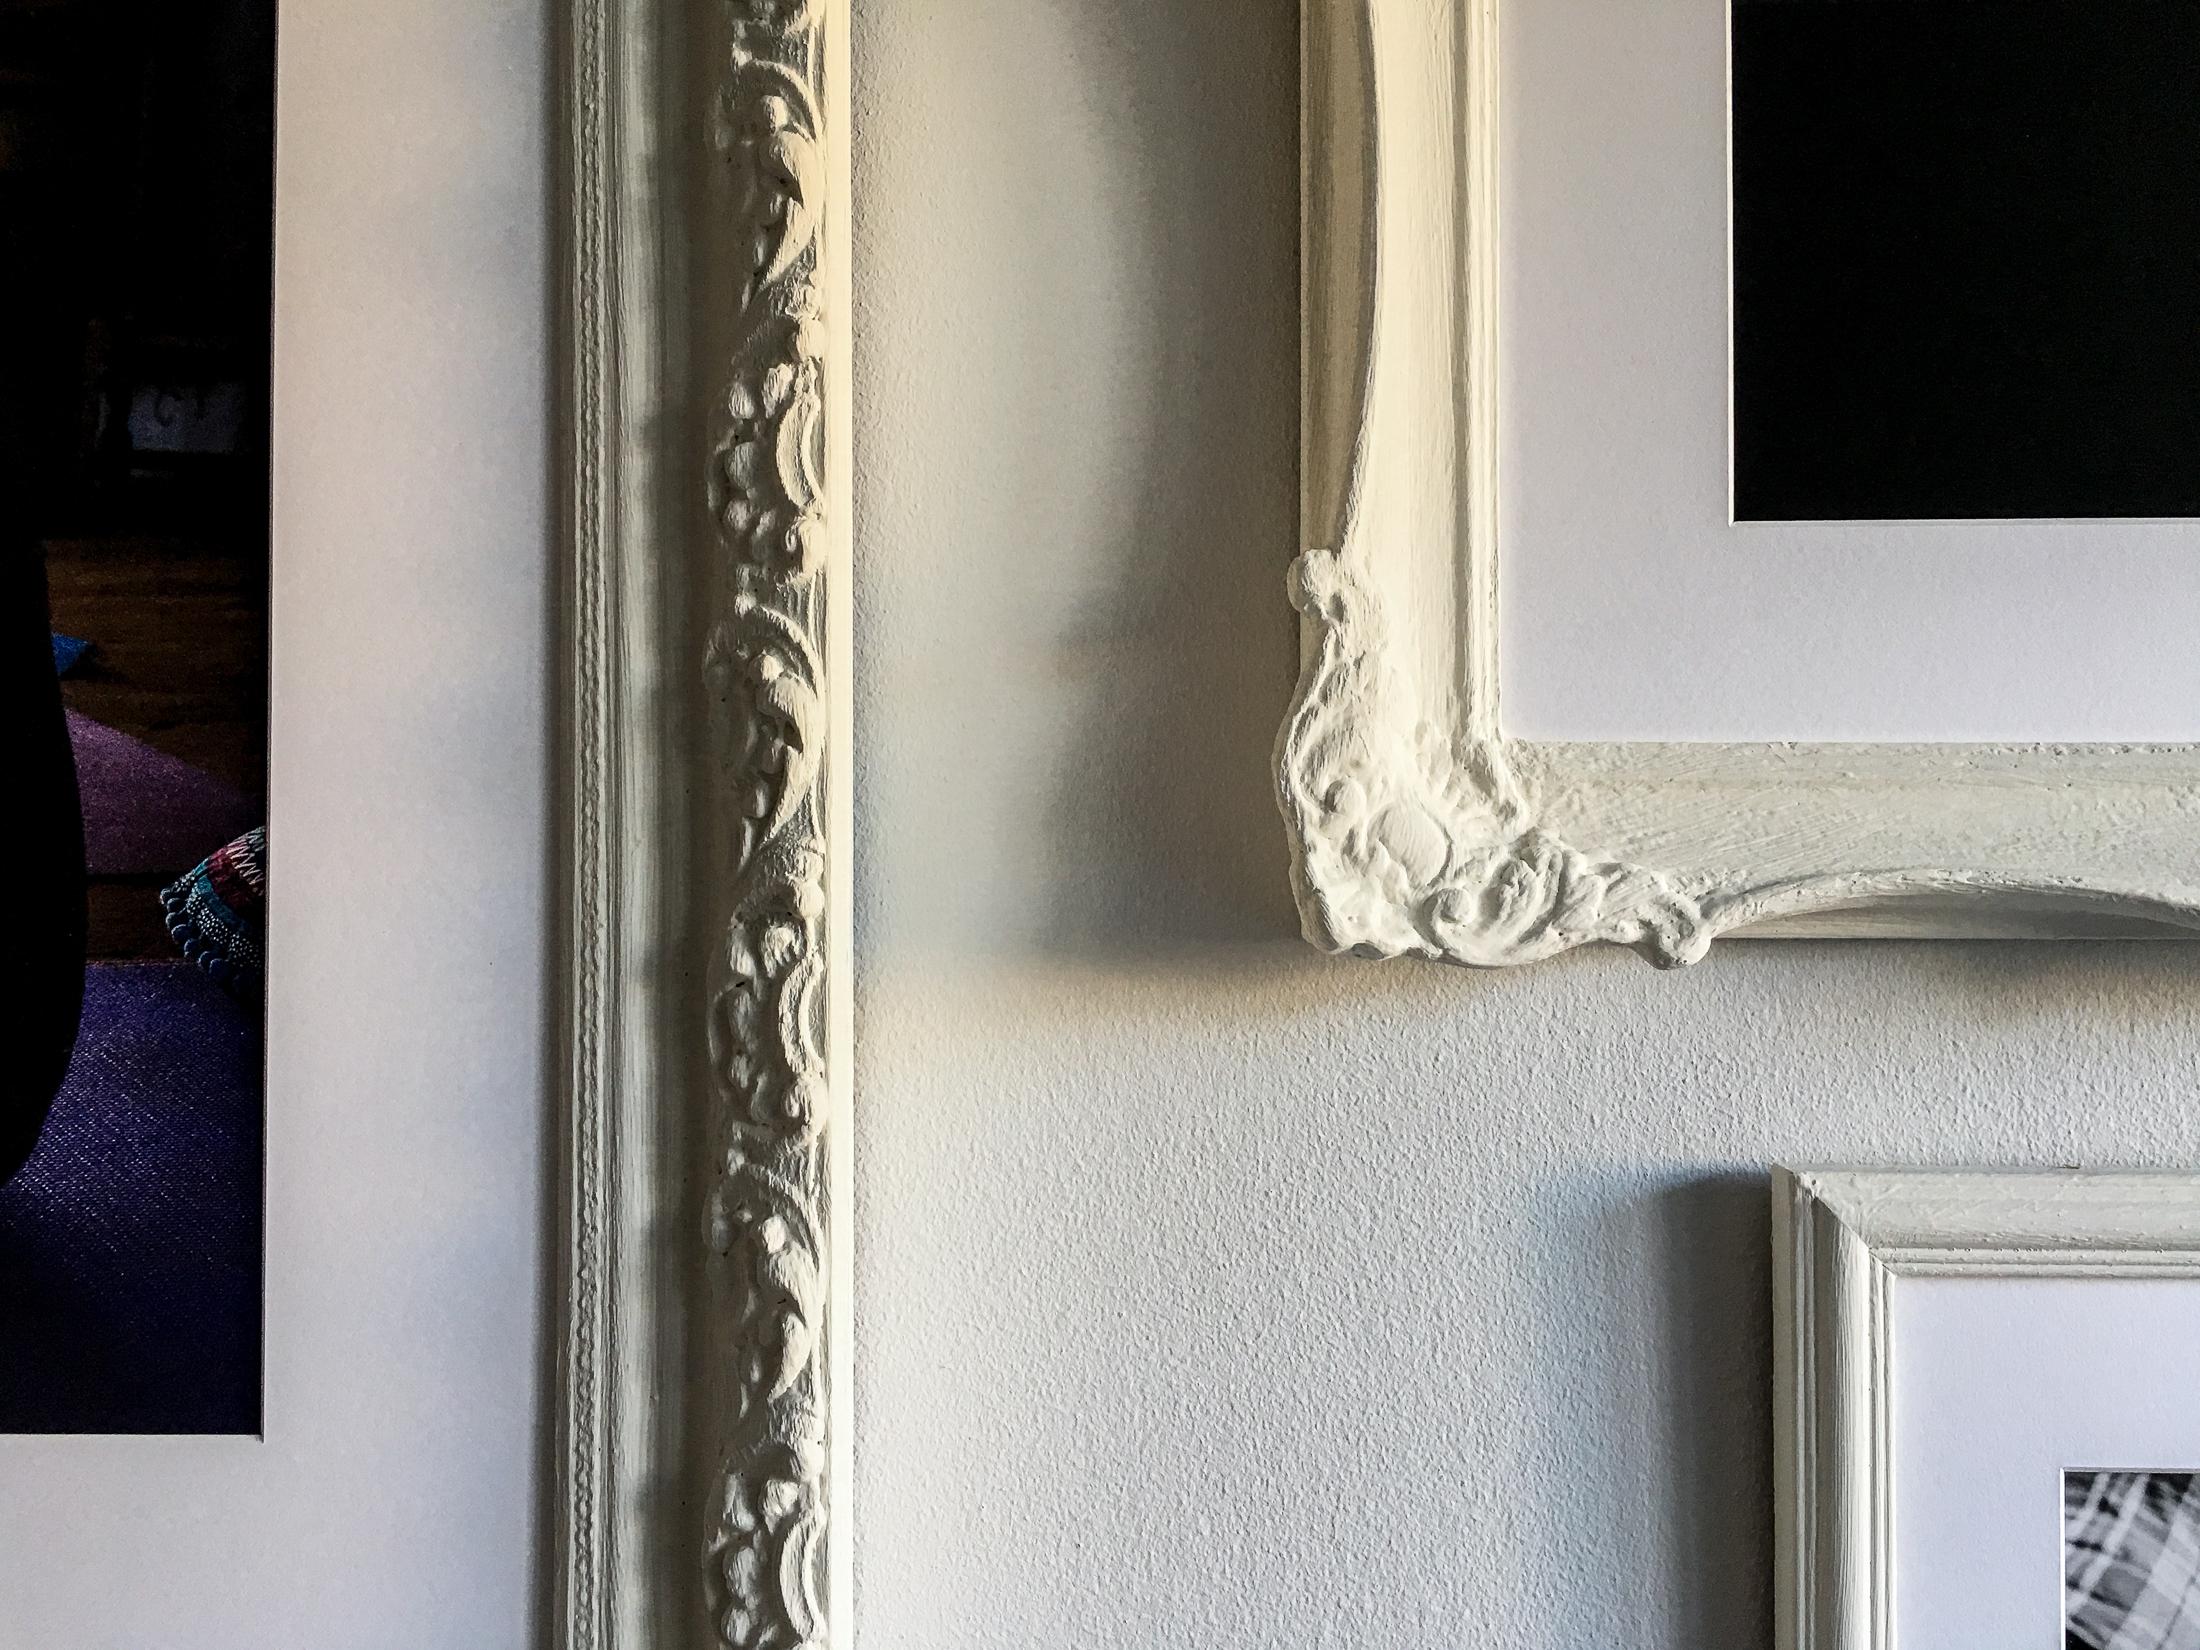 DIY-Photo-Display-Wall-gallery-3.jpg